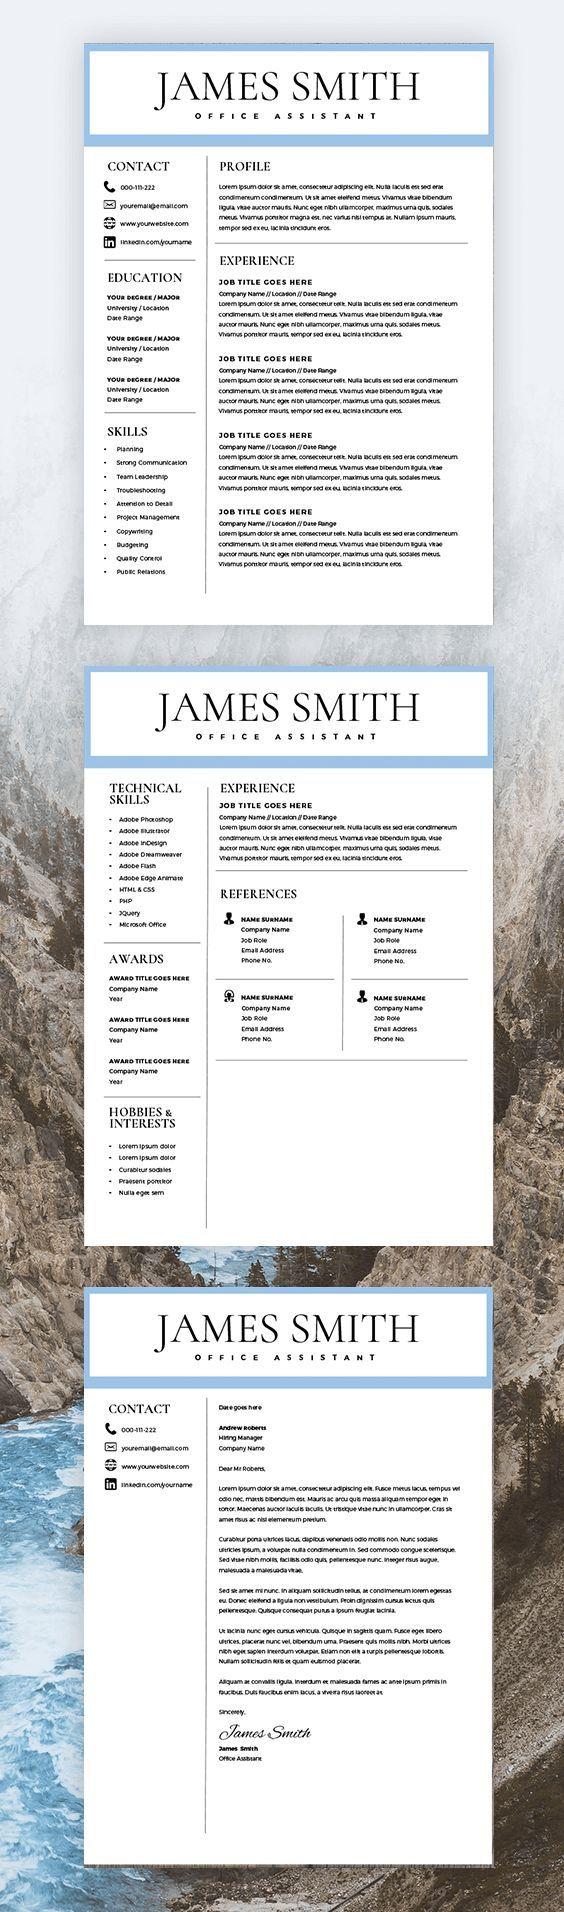 92 best CV images on Pinterest | Resume design, Creative curriculum ...